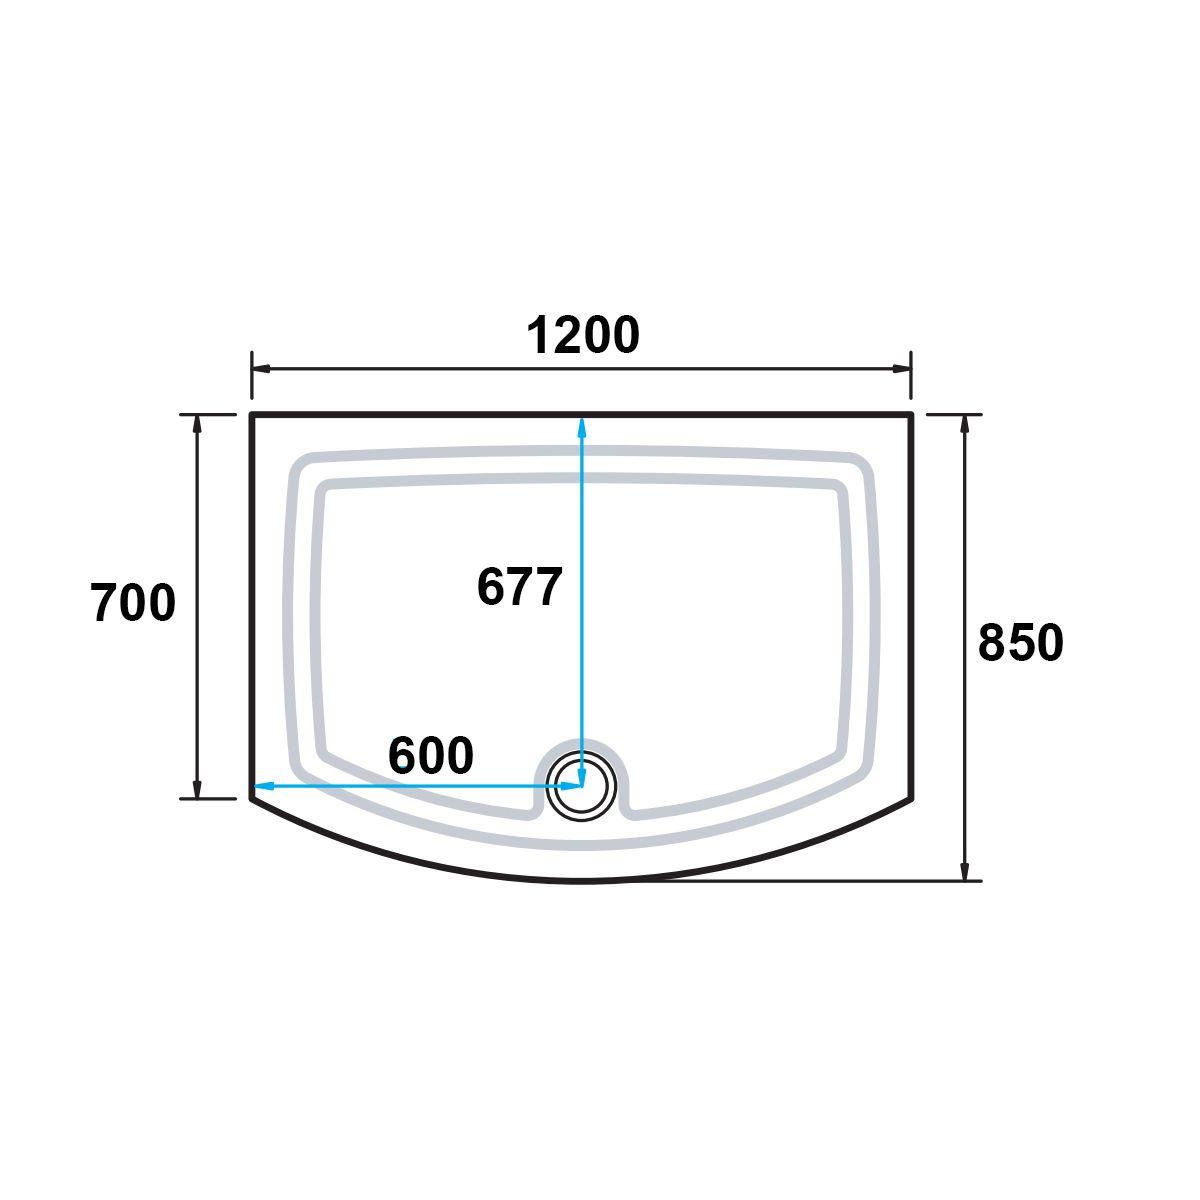 kudosconcept2showertray1200x700dimensions